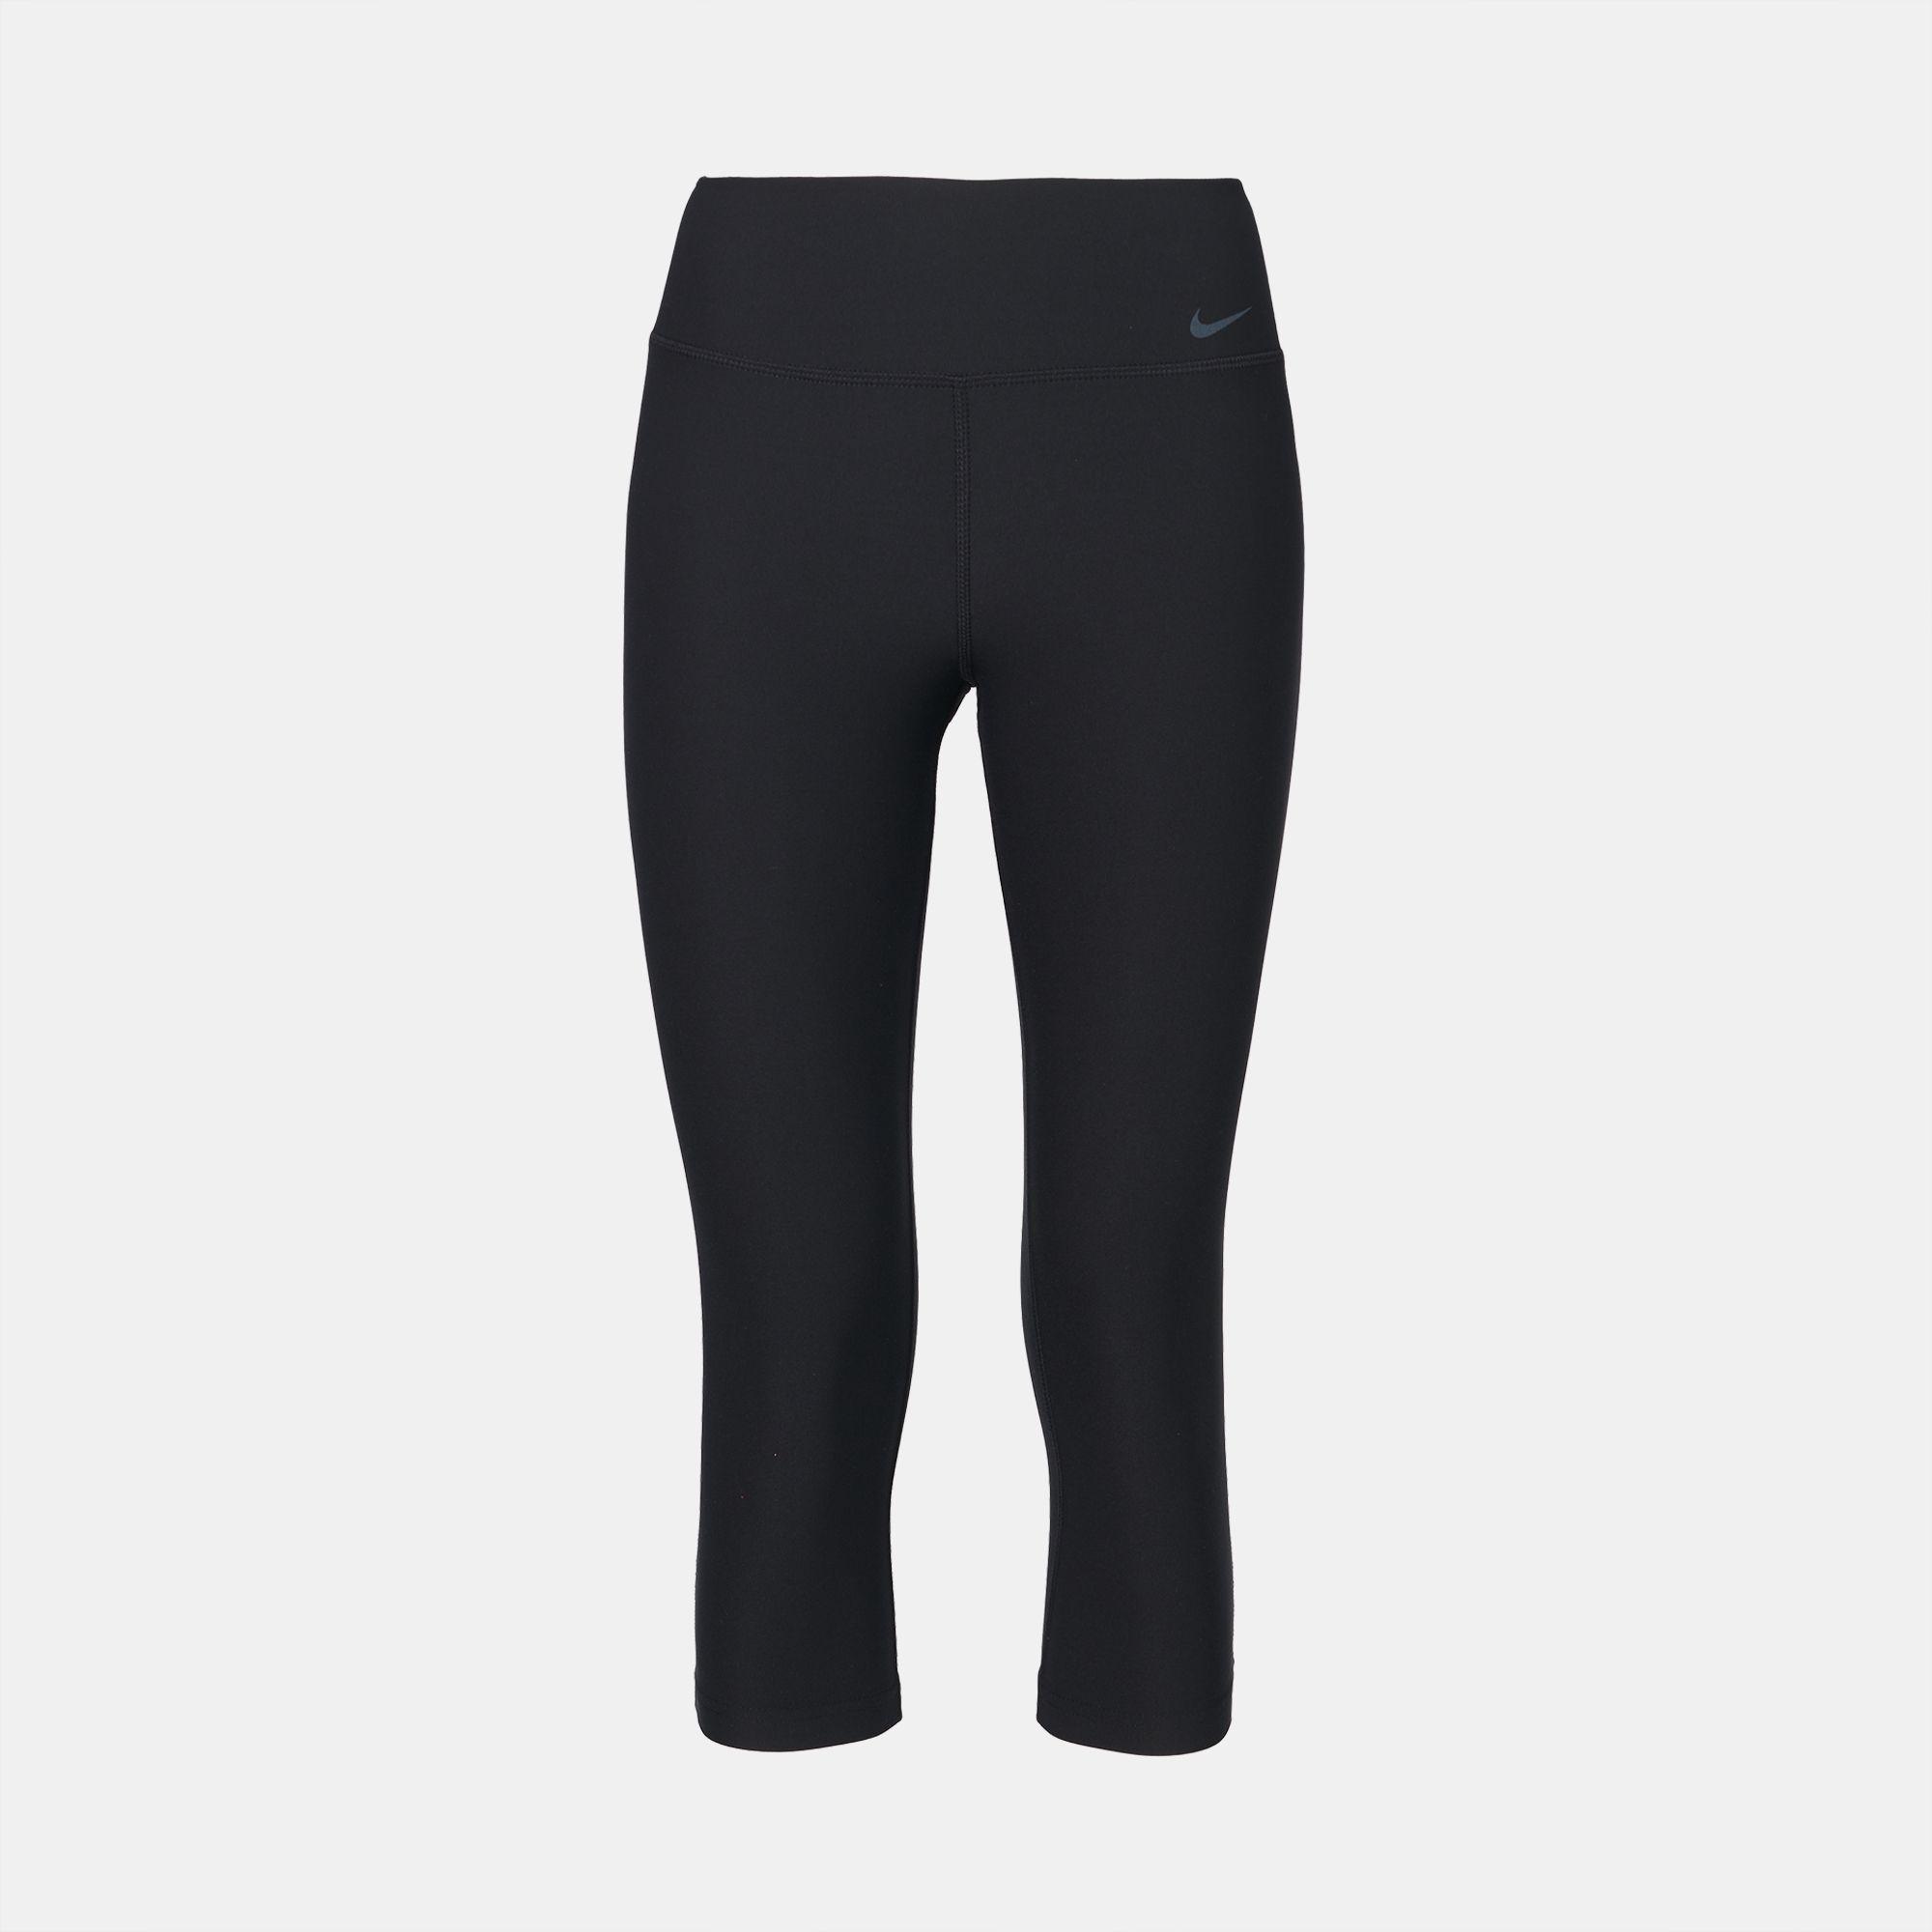 e5f83bde07362 Shop Black Nike Legend 2.0 Poly Training Capri Leggings for Womens ...